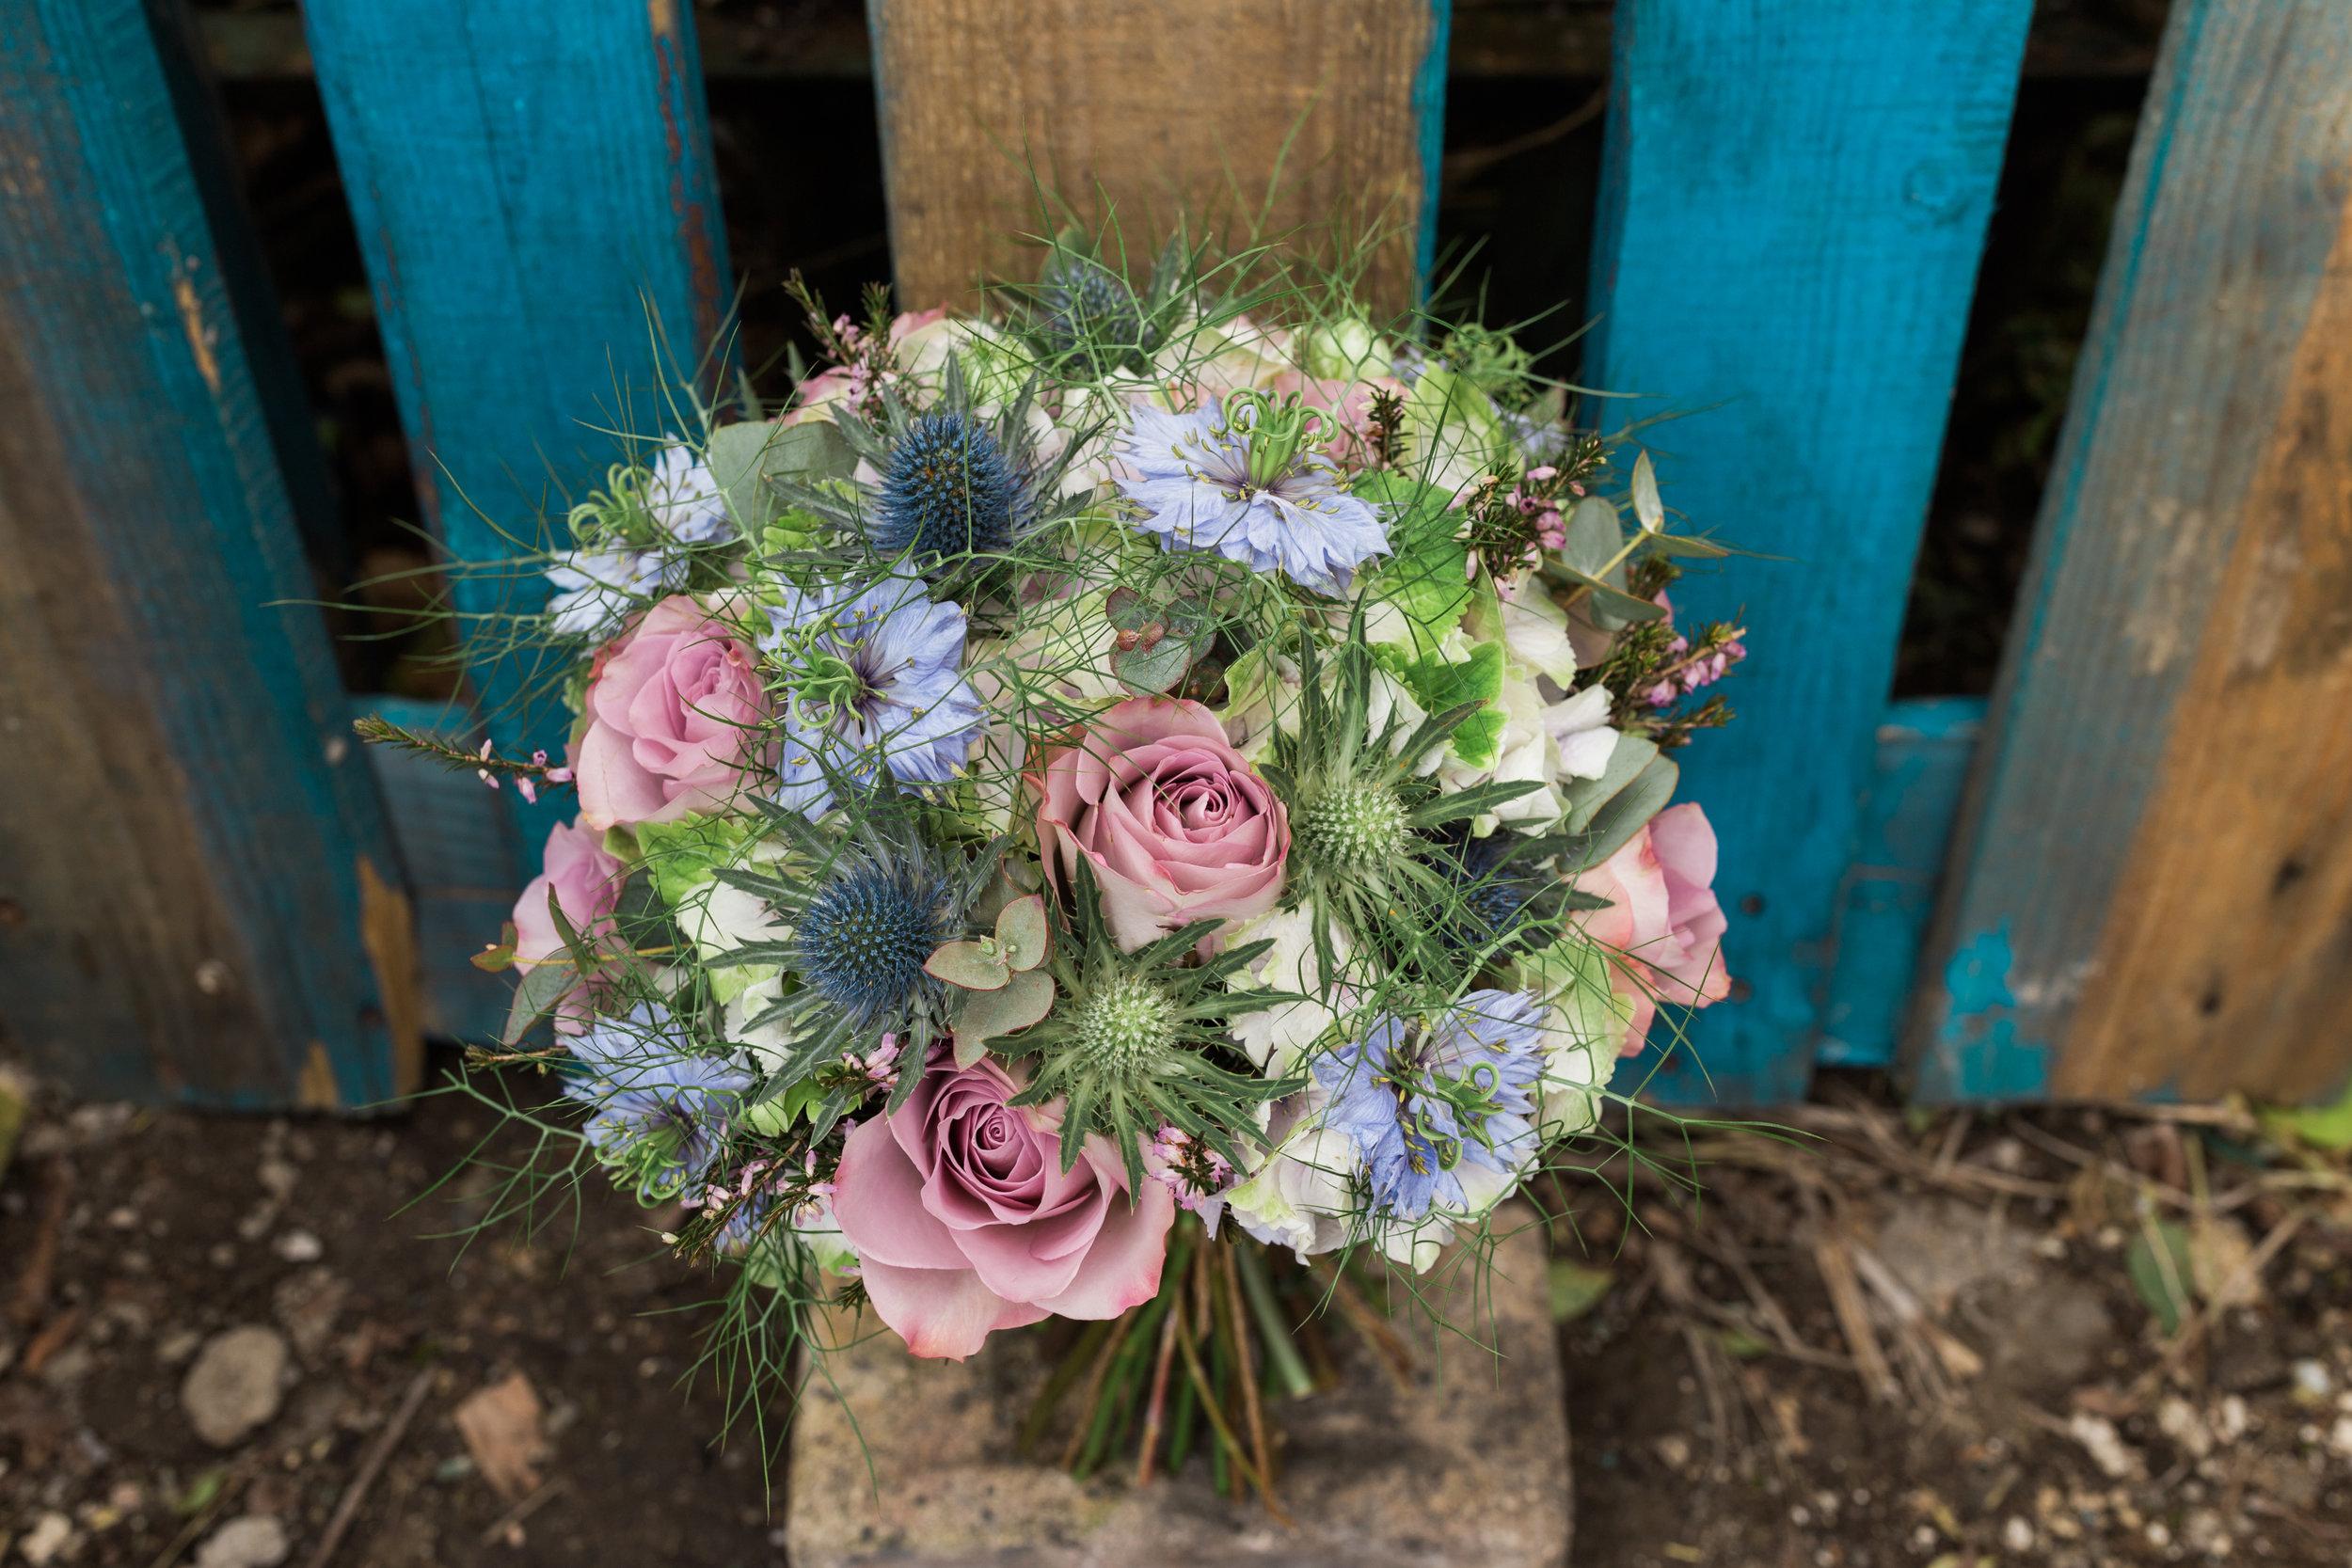 A very Scottish themed bouquet with Memory Lane roses, eryngium, heather, nigella, hydrangea & eucalyptus.